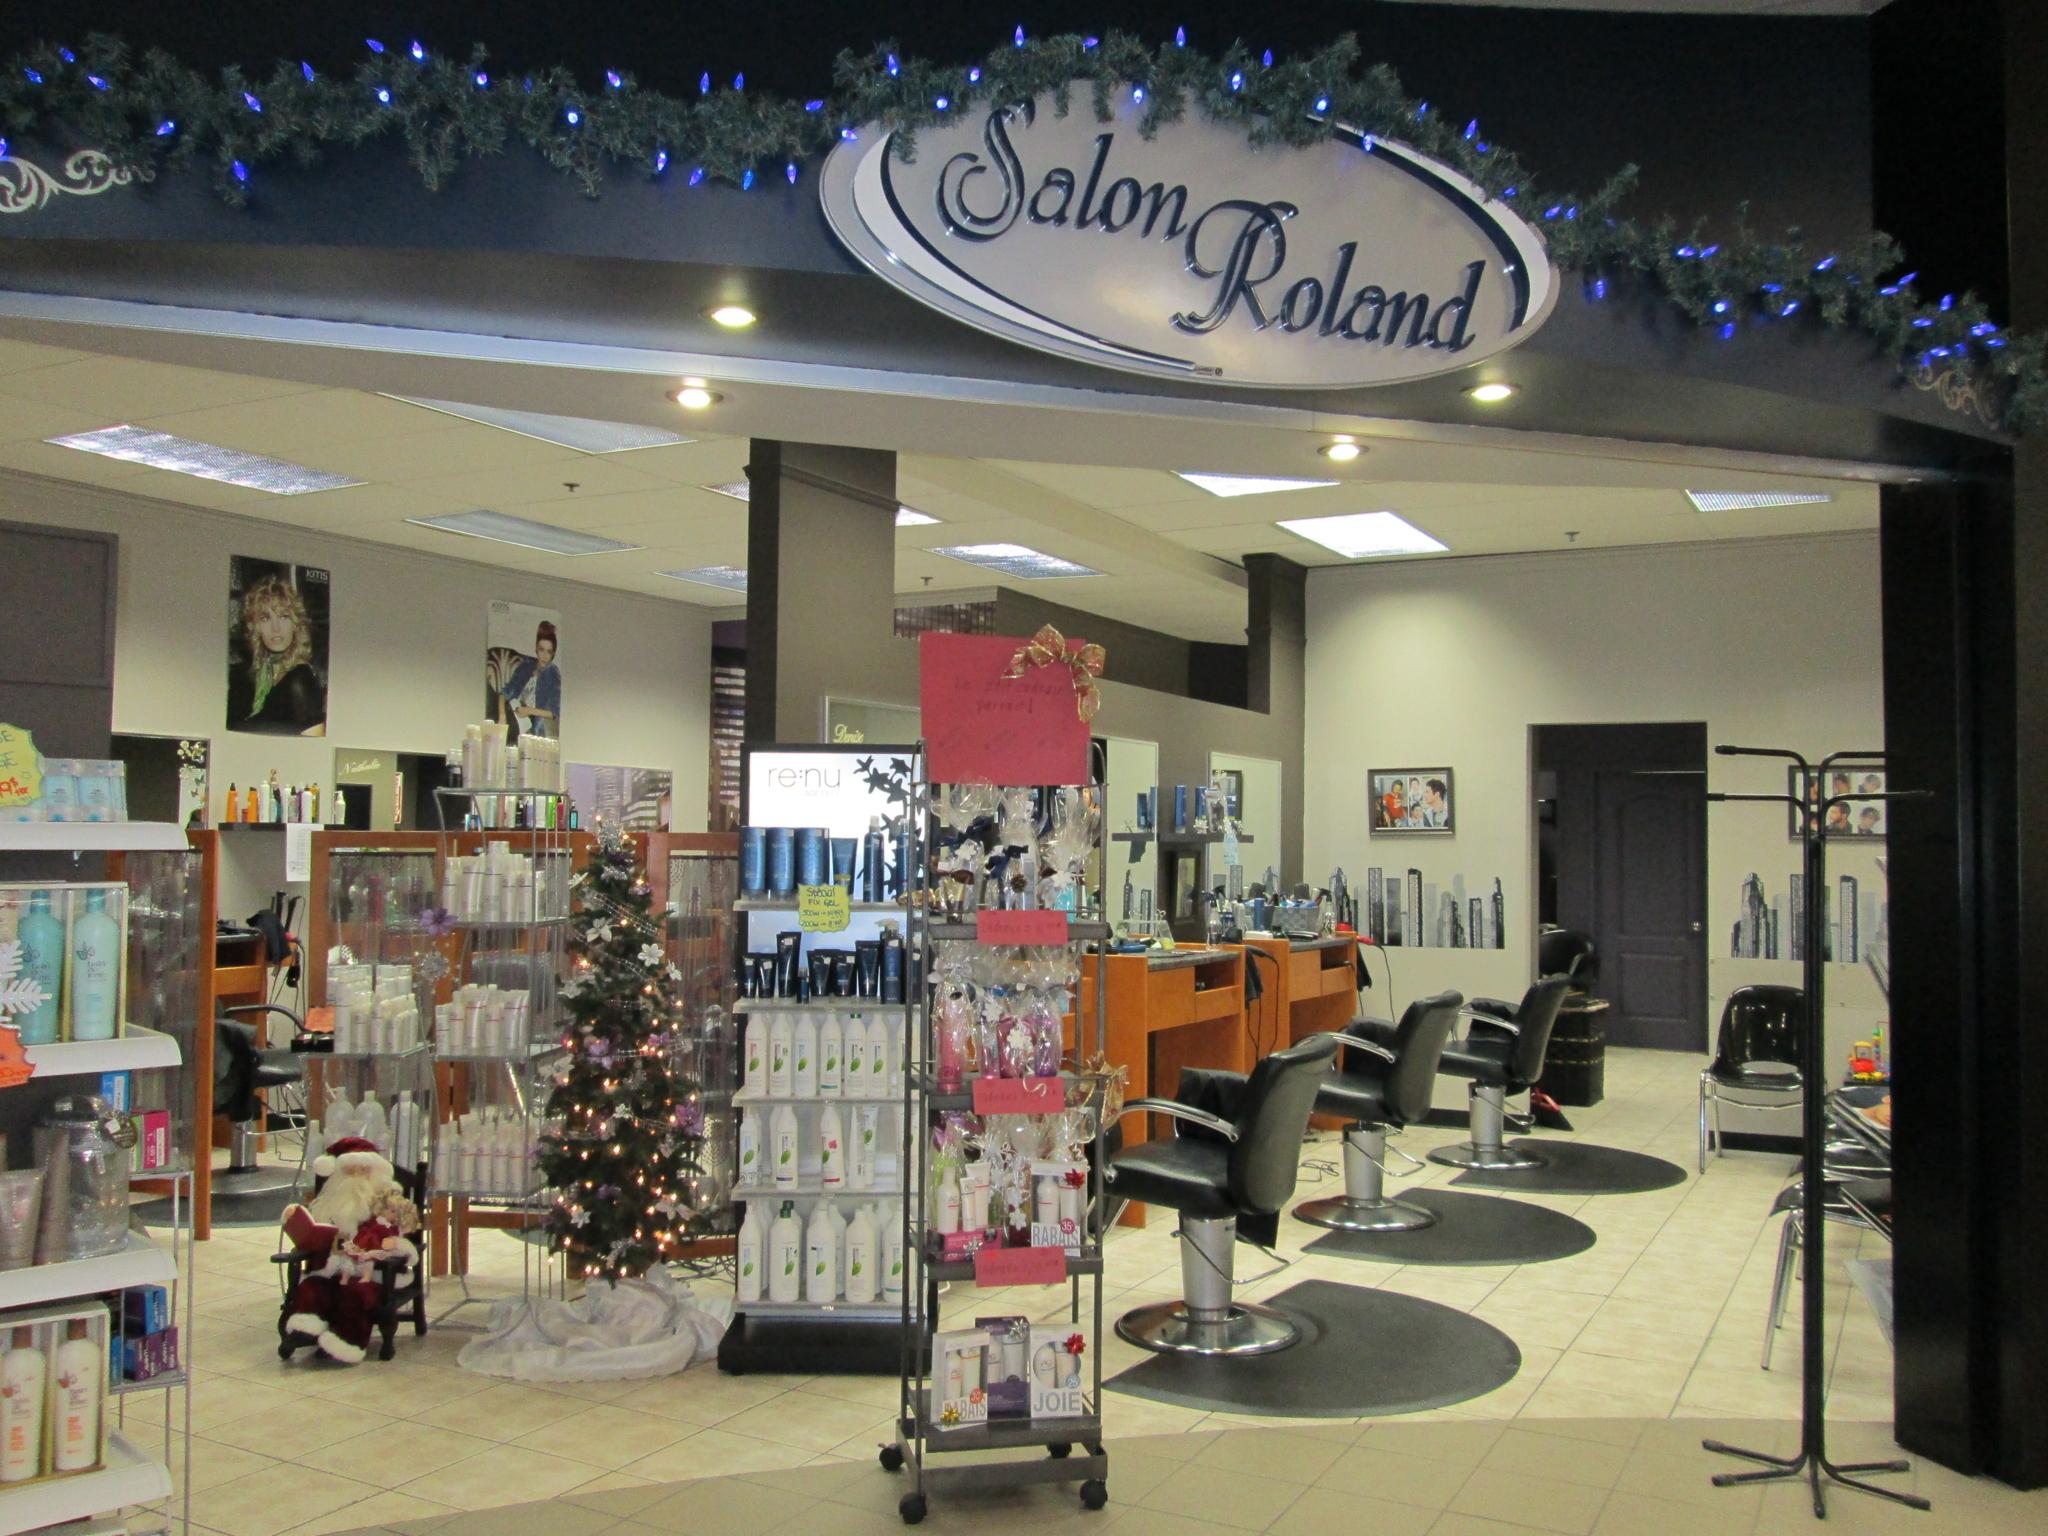 Salon Roland